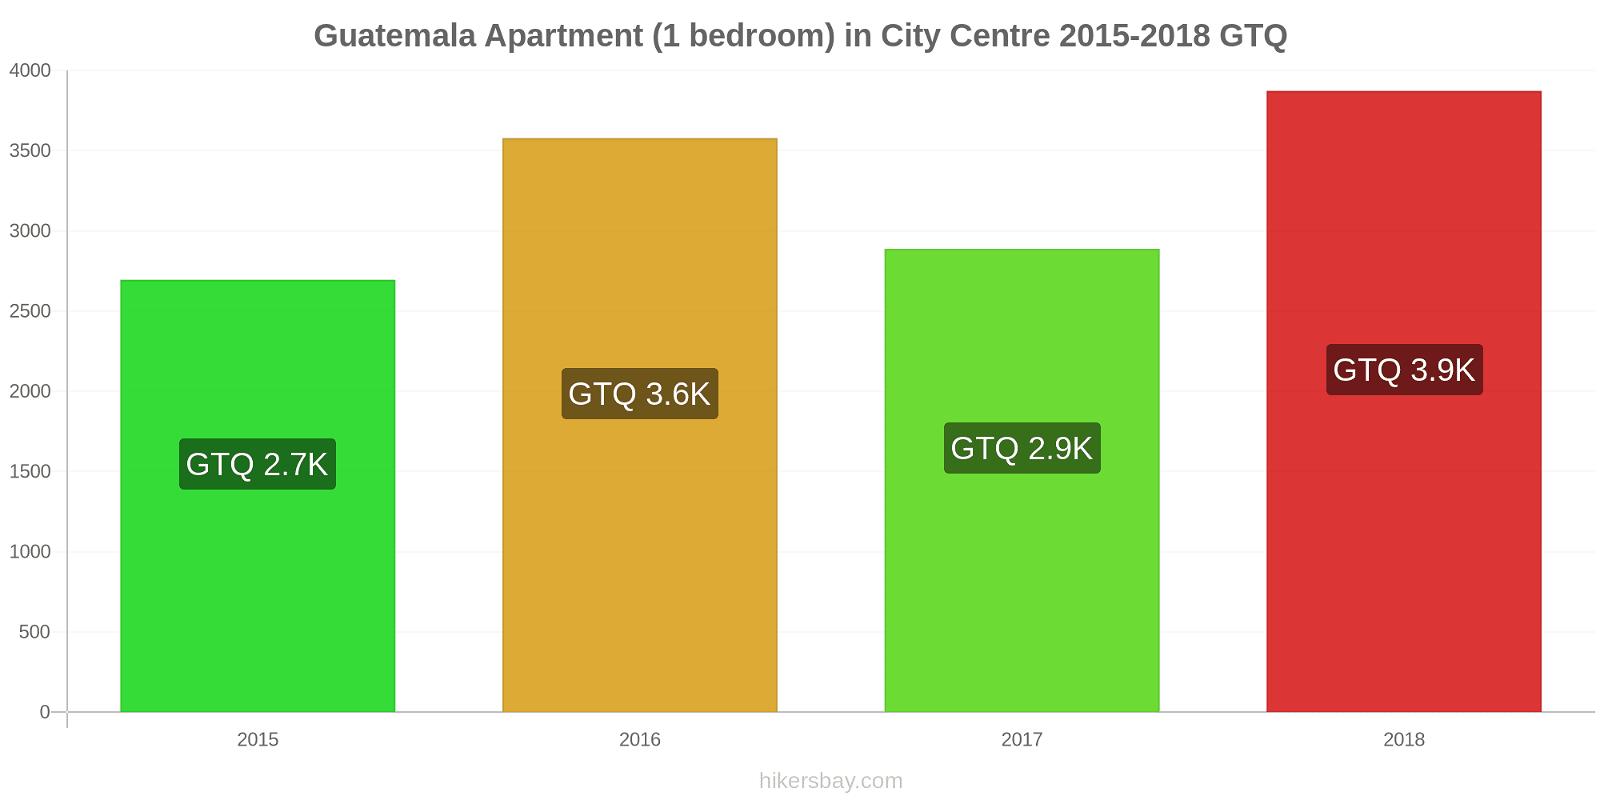 Guatemala price changes Apartment (1 bedroom) in City Centre hikersbay.com